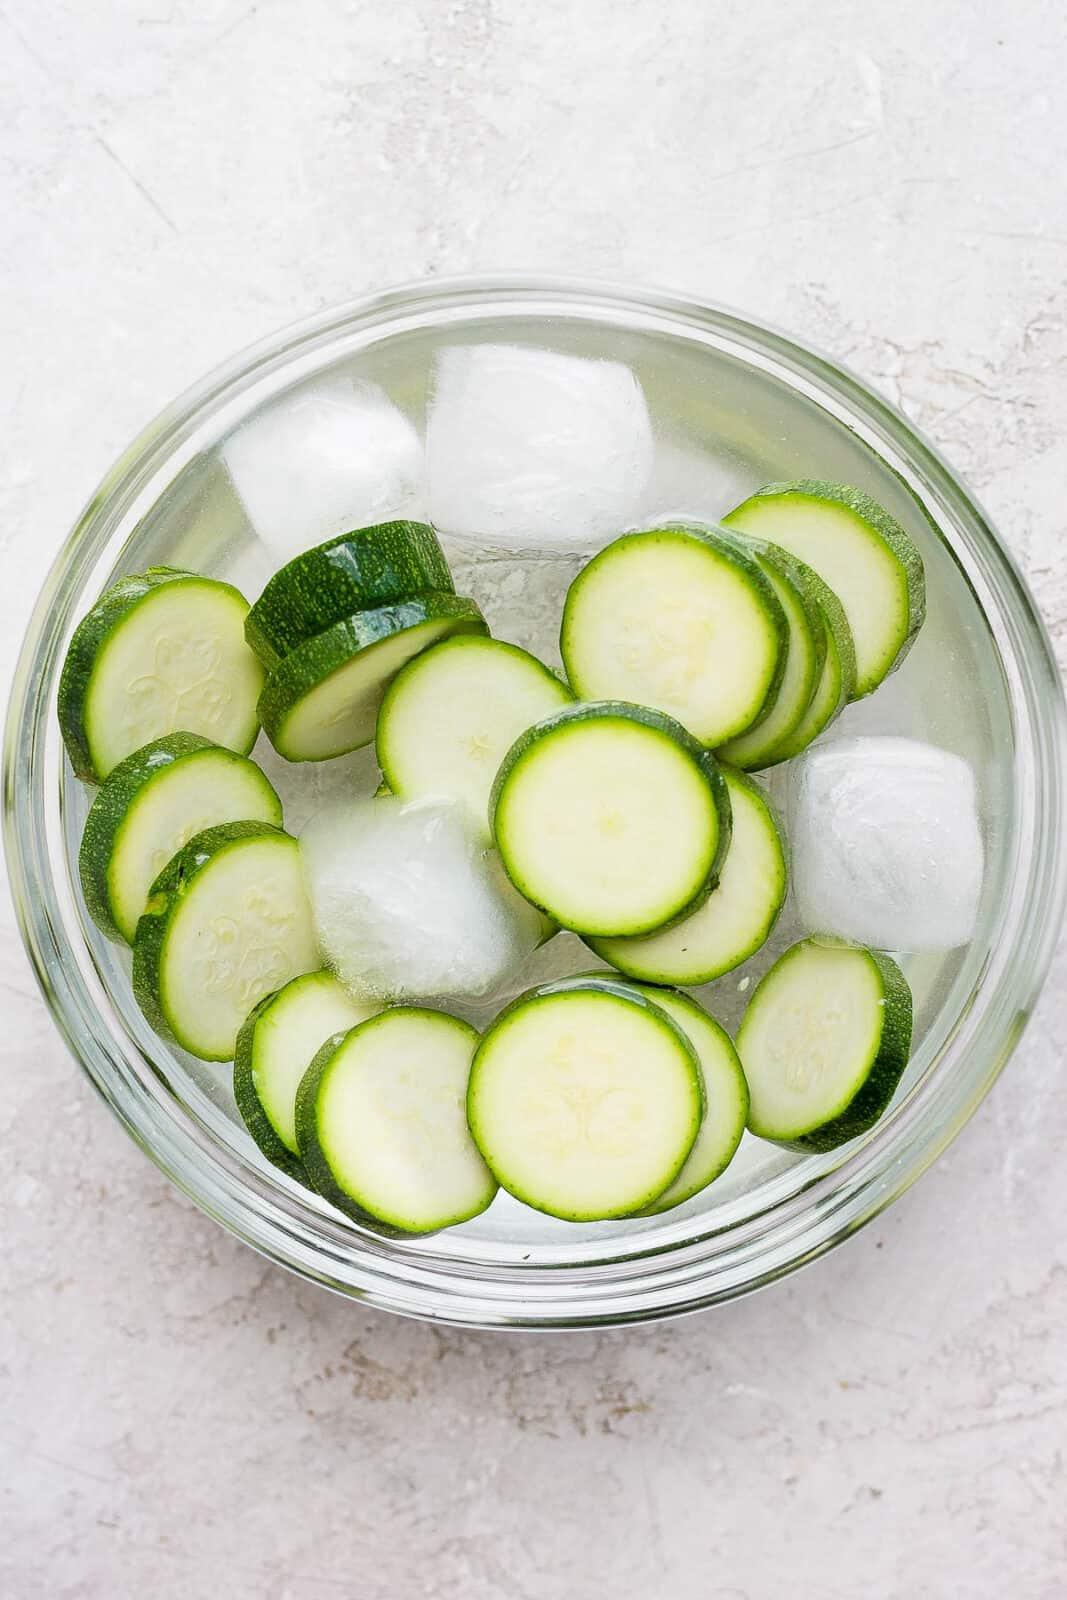 Zucchini slices in an ice bath.